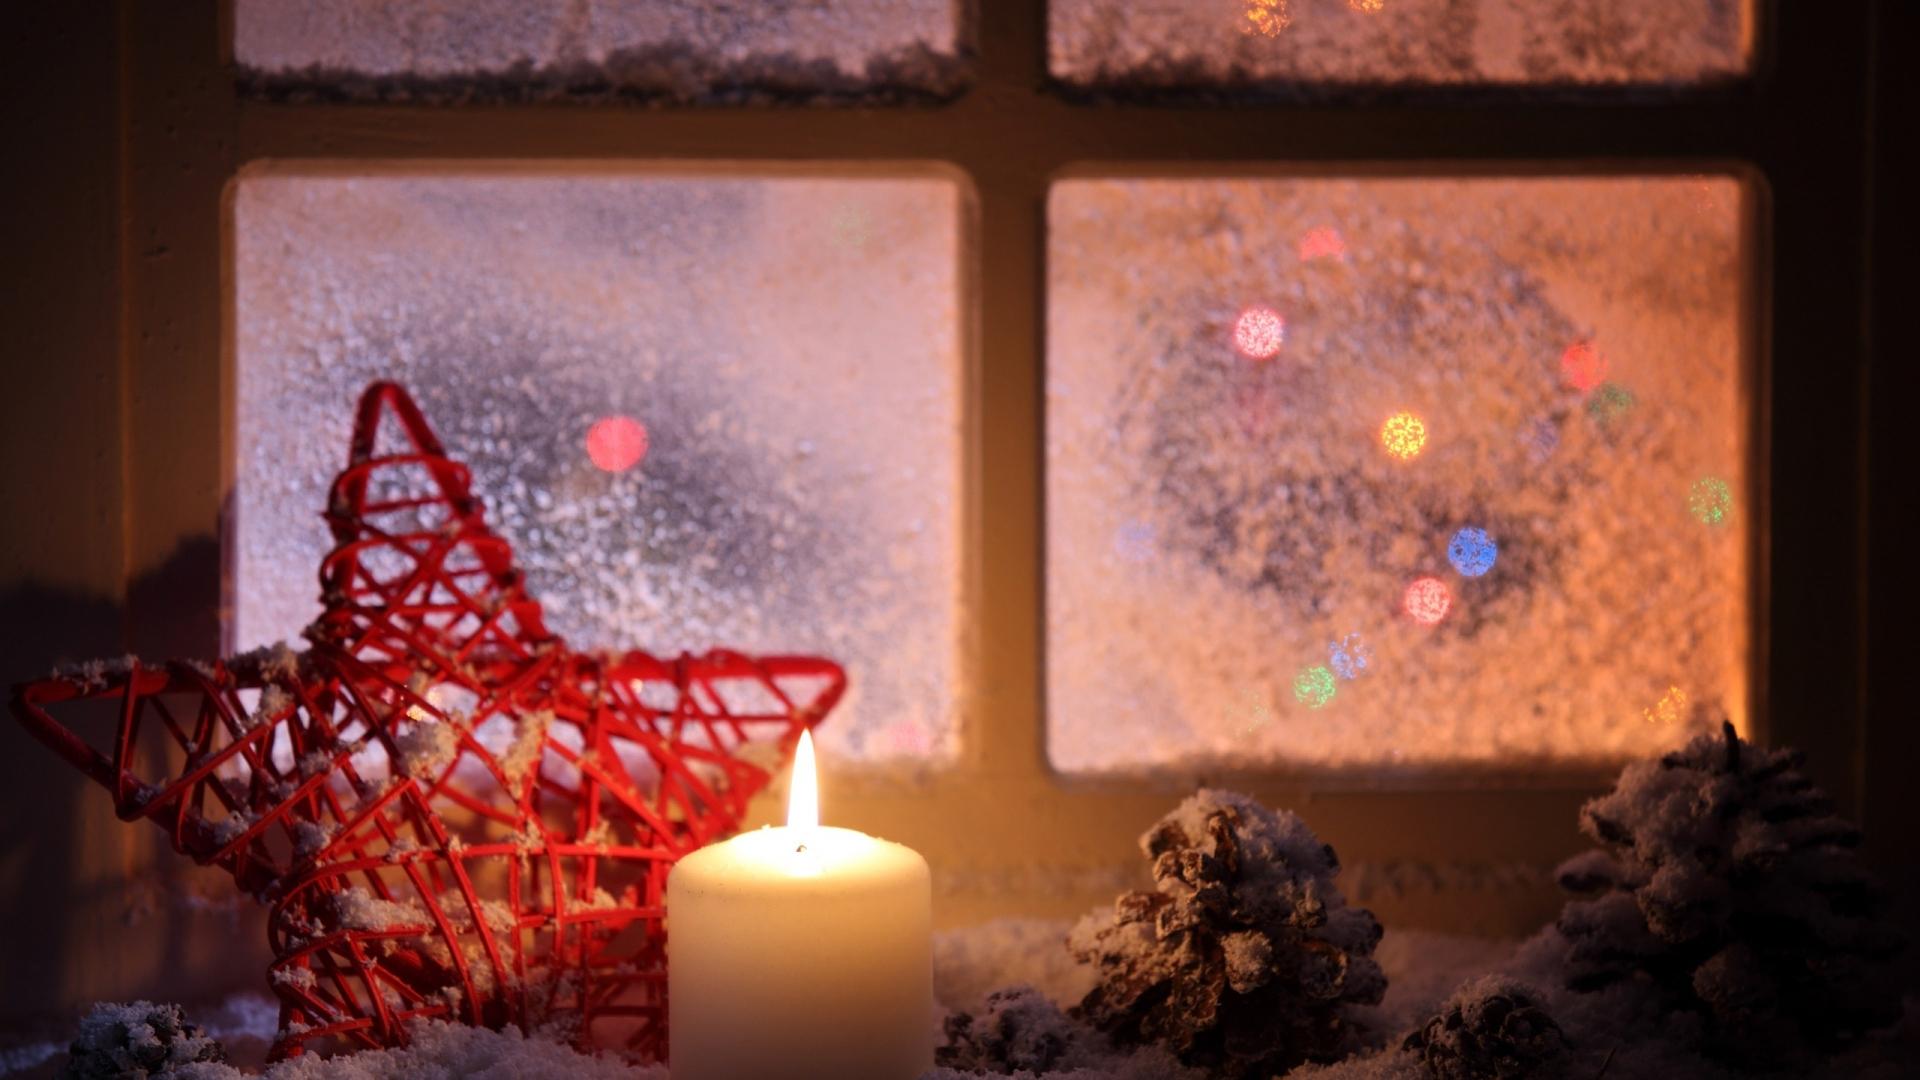 Vela junto a la ventana en navidad - 1920x1080